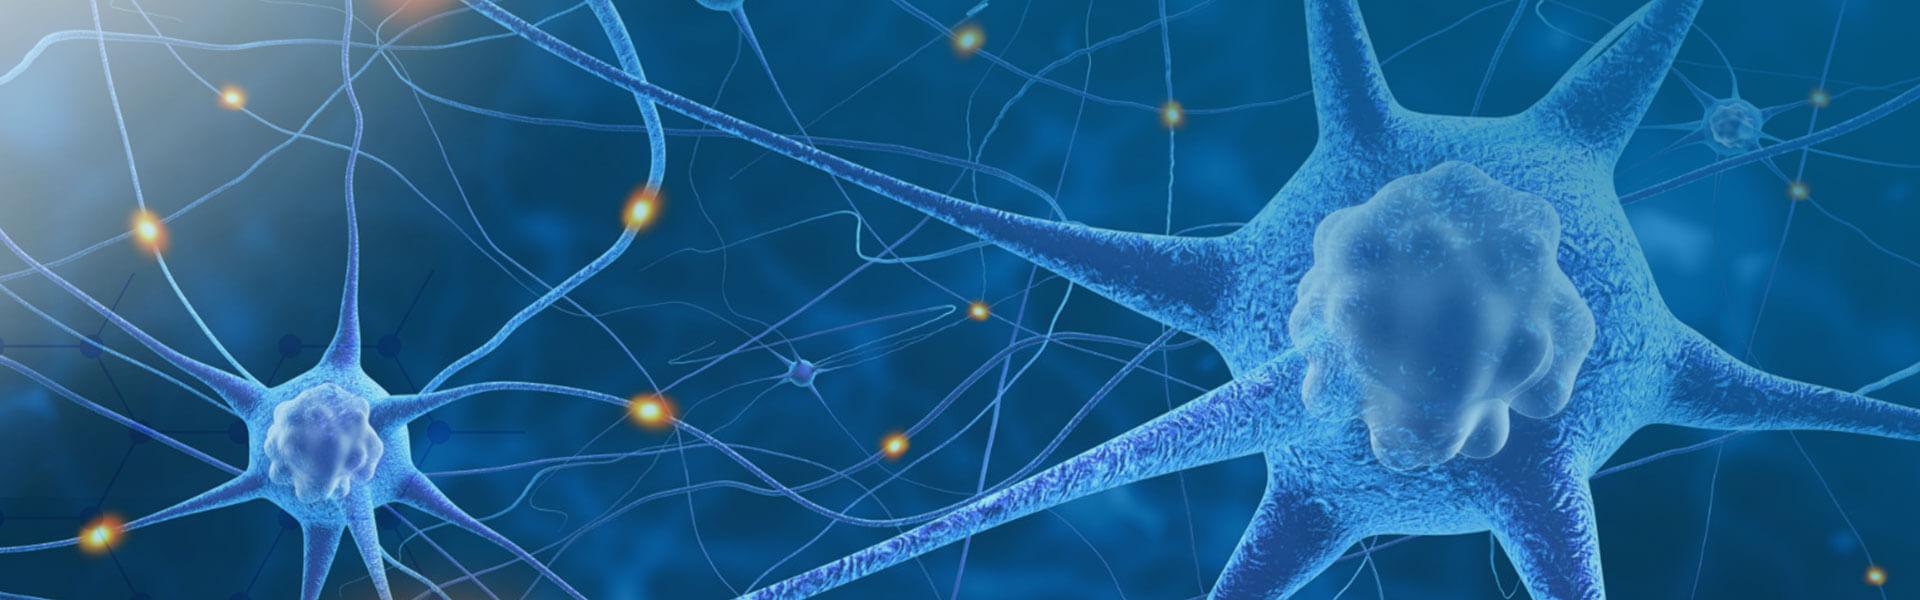 Neuropathy Management